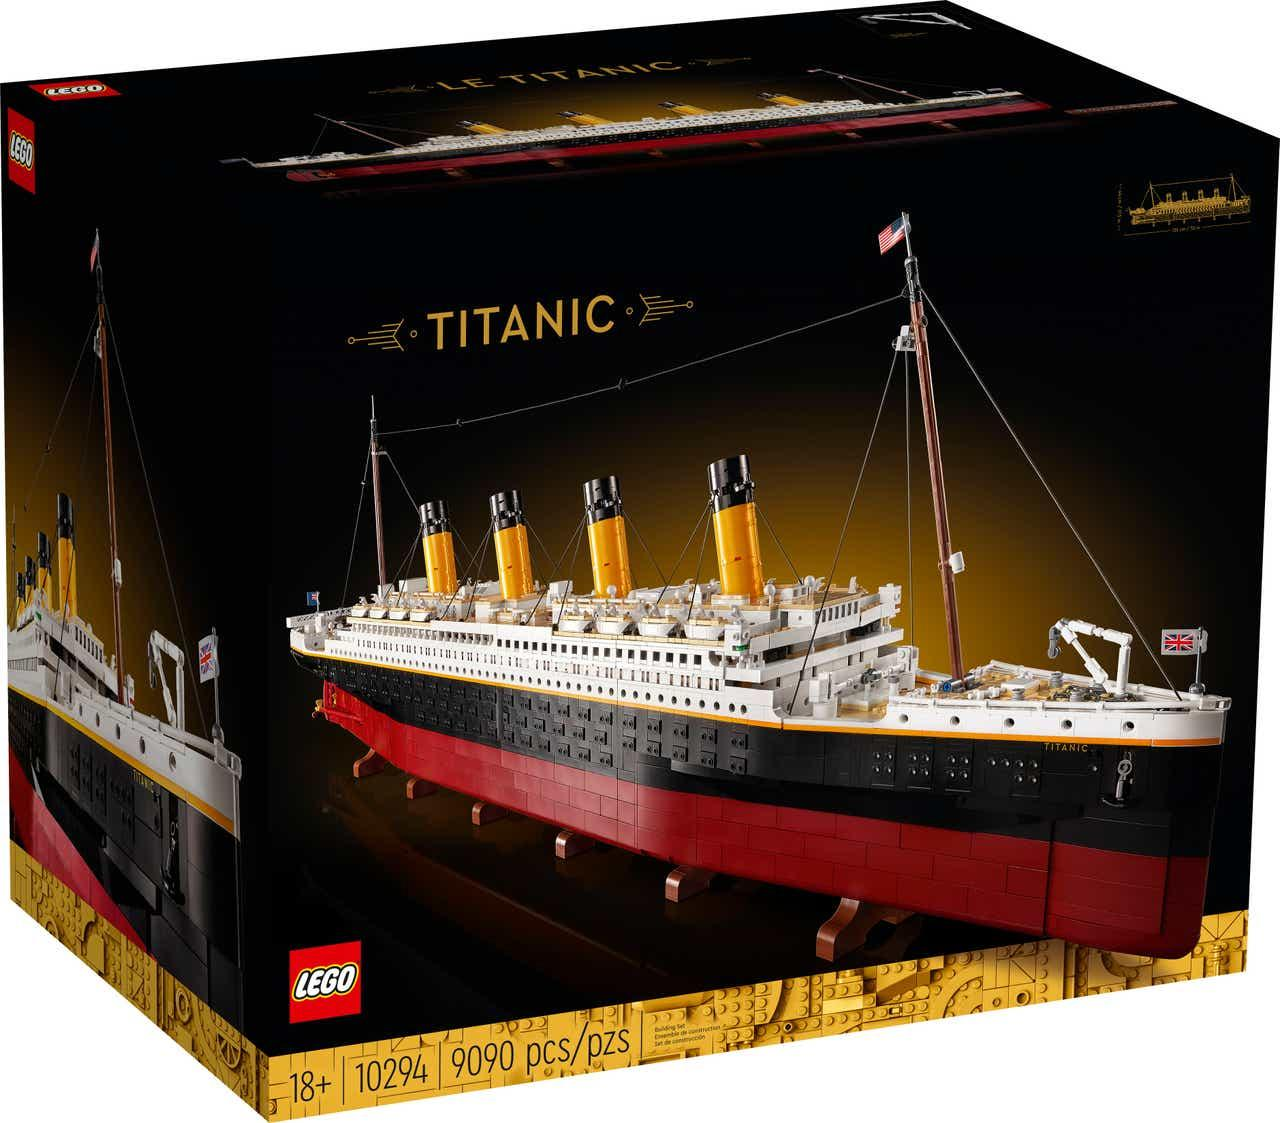 lego-titanic-box.jpg